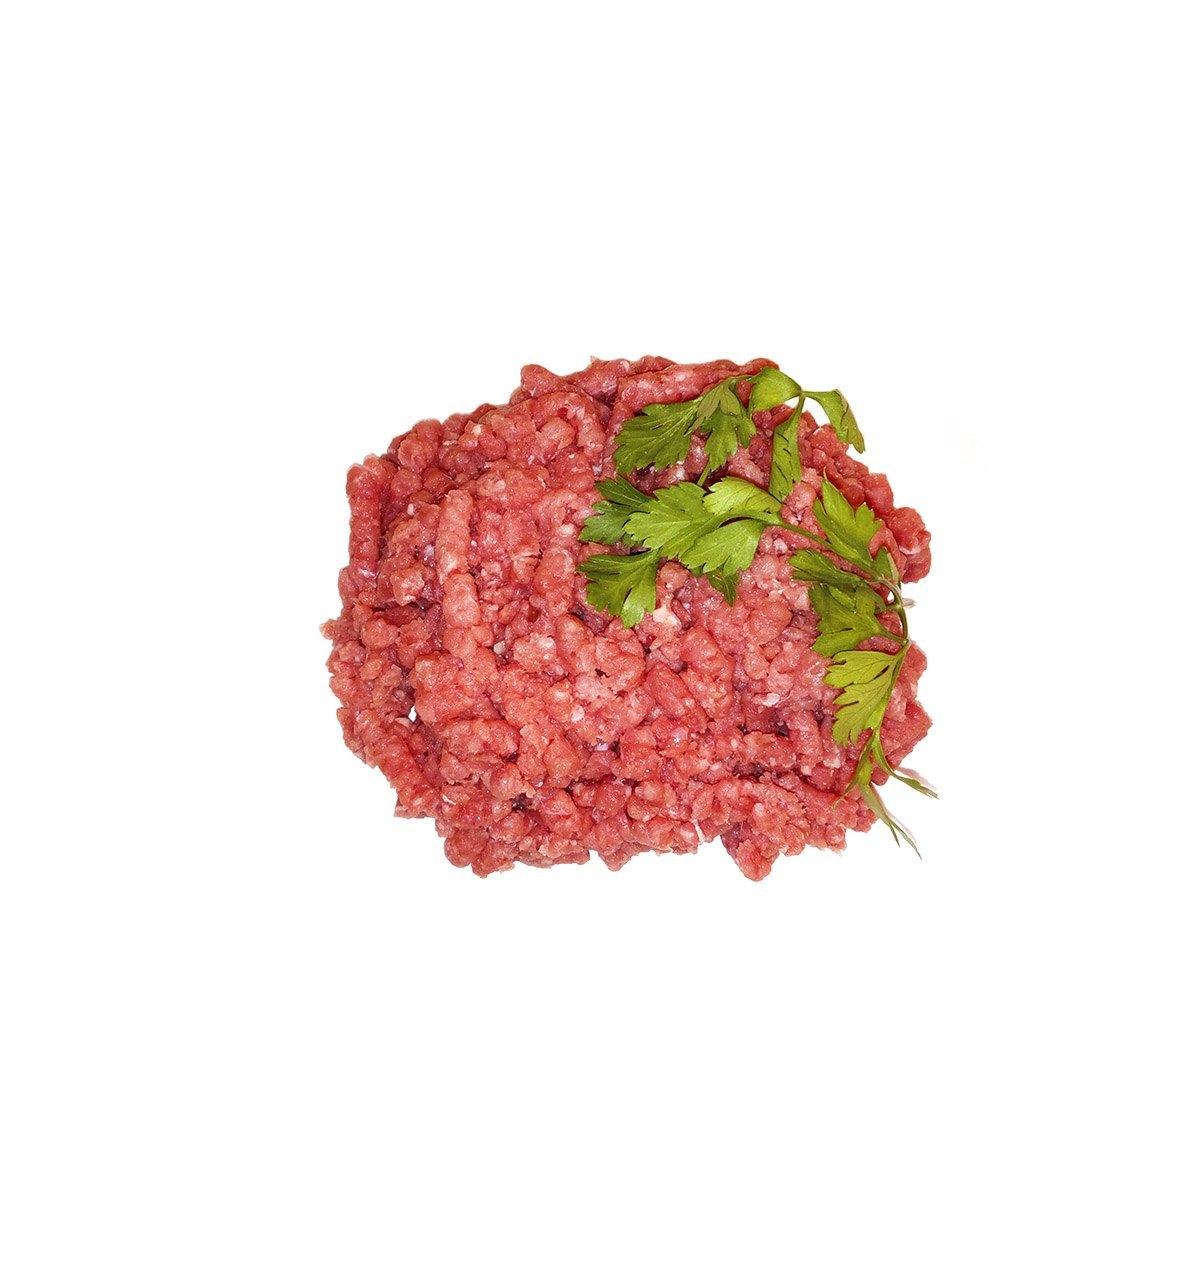 Comprar Carne picada